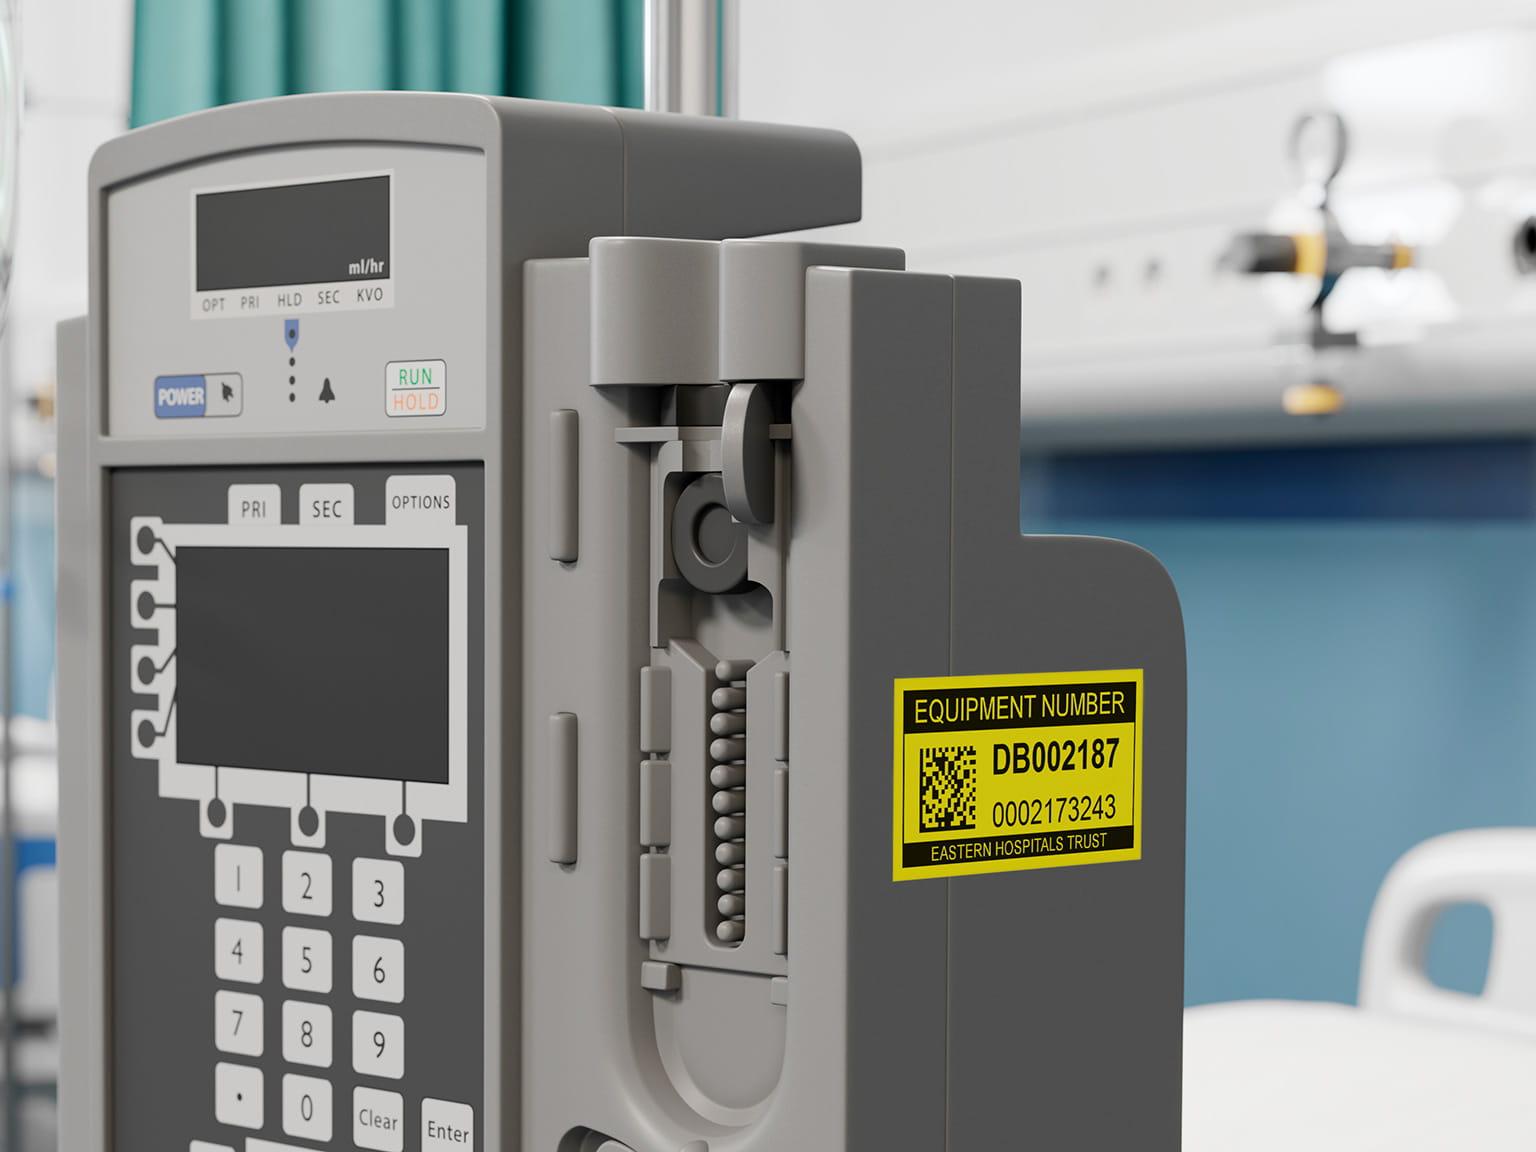 Etichetă de inventar Brother P-touch negru pe galben pe echipament medical